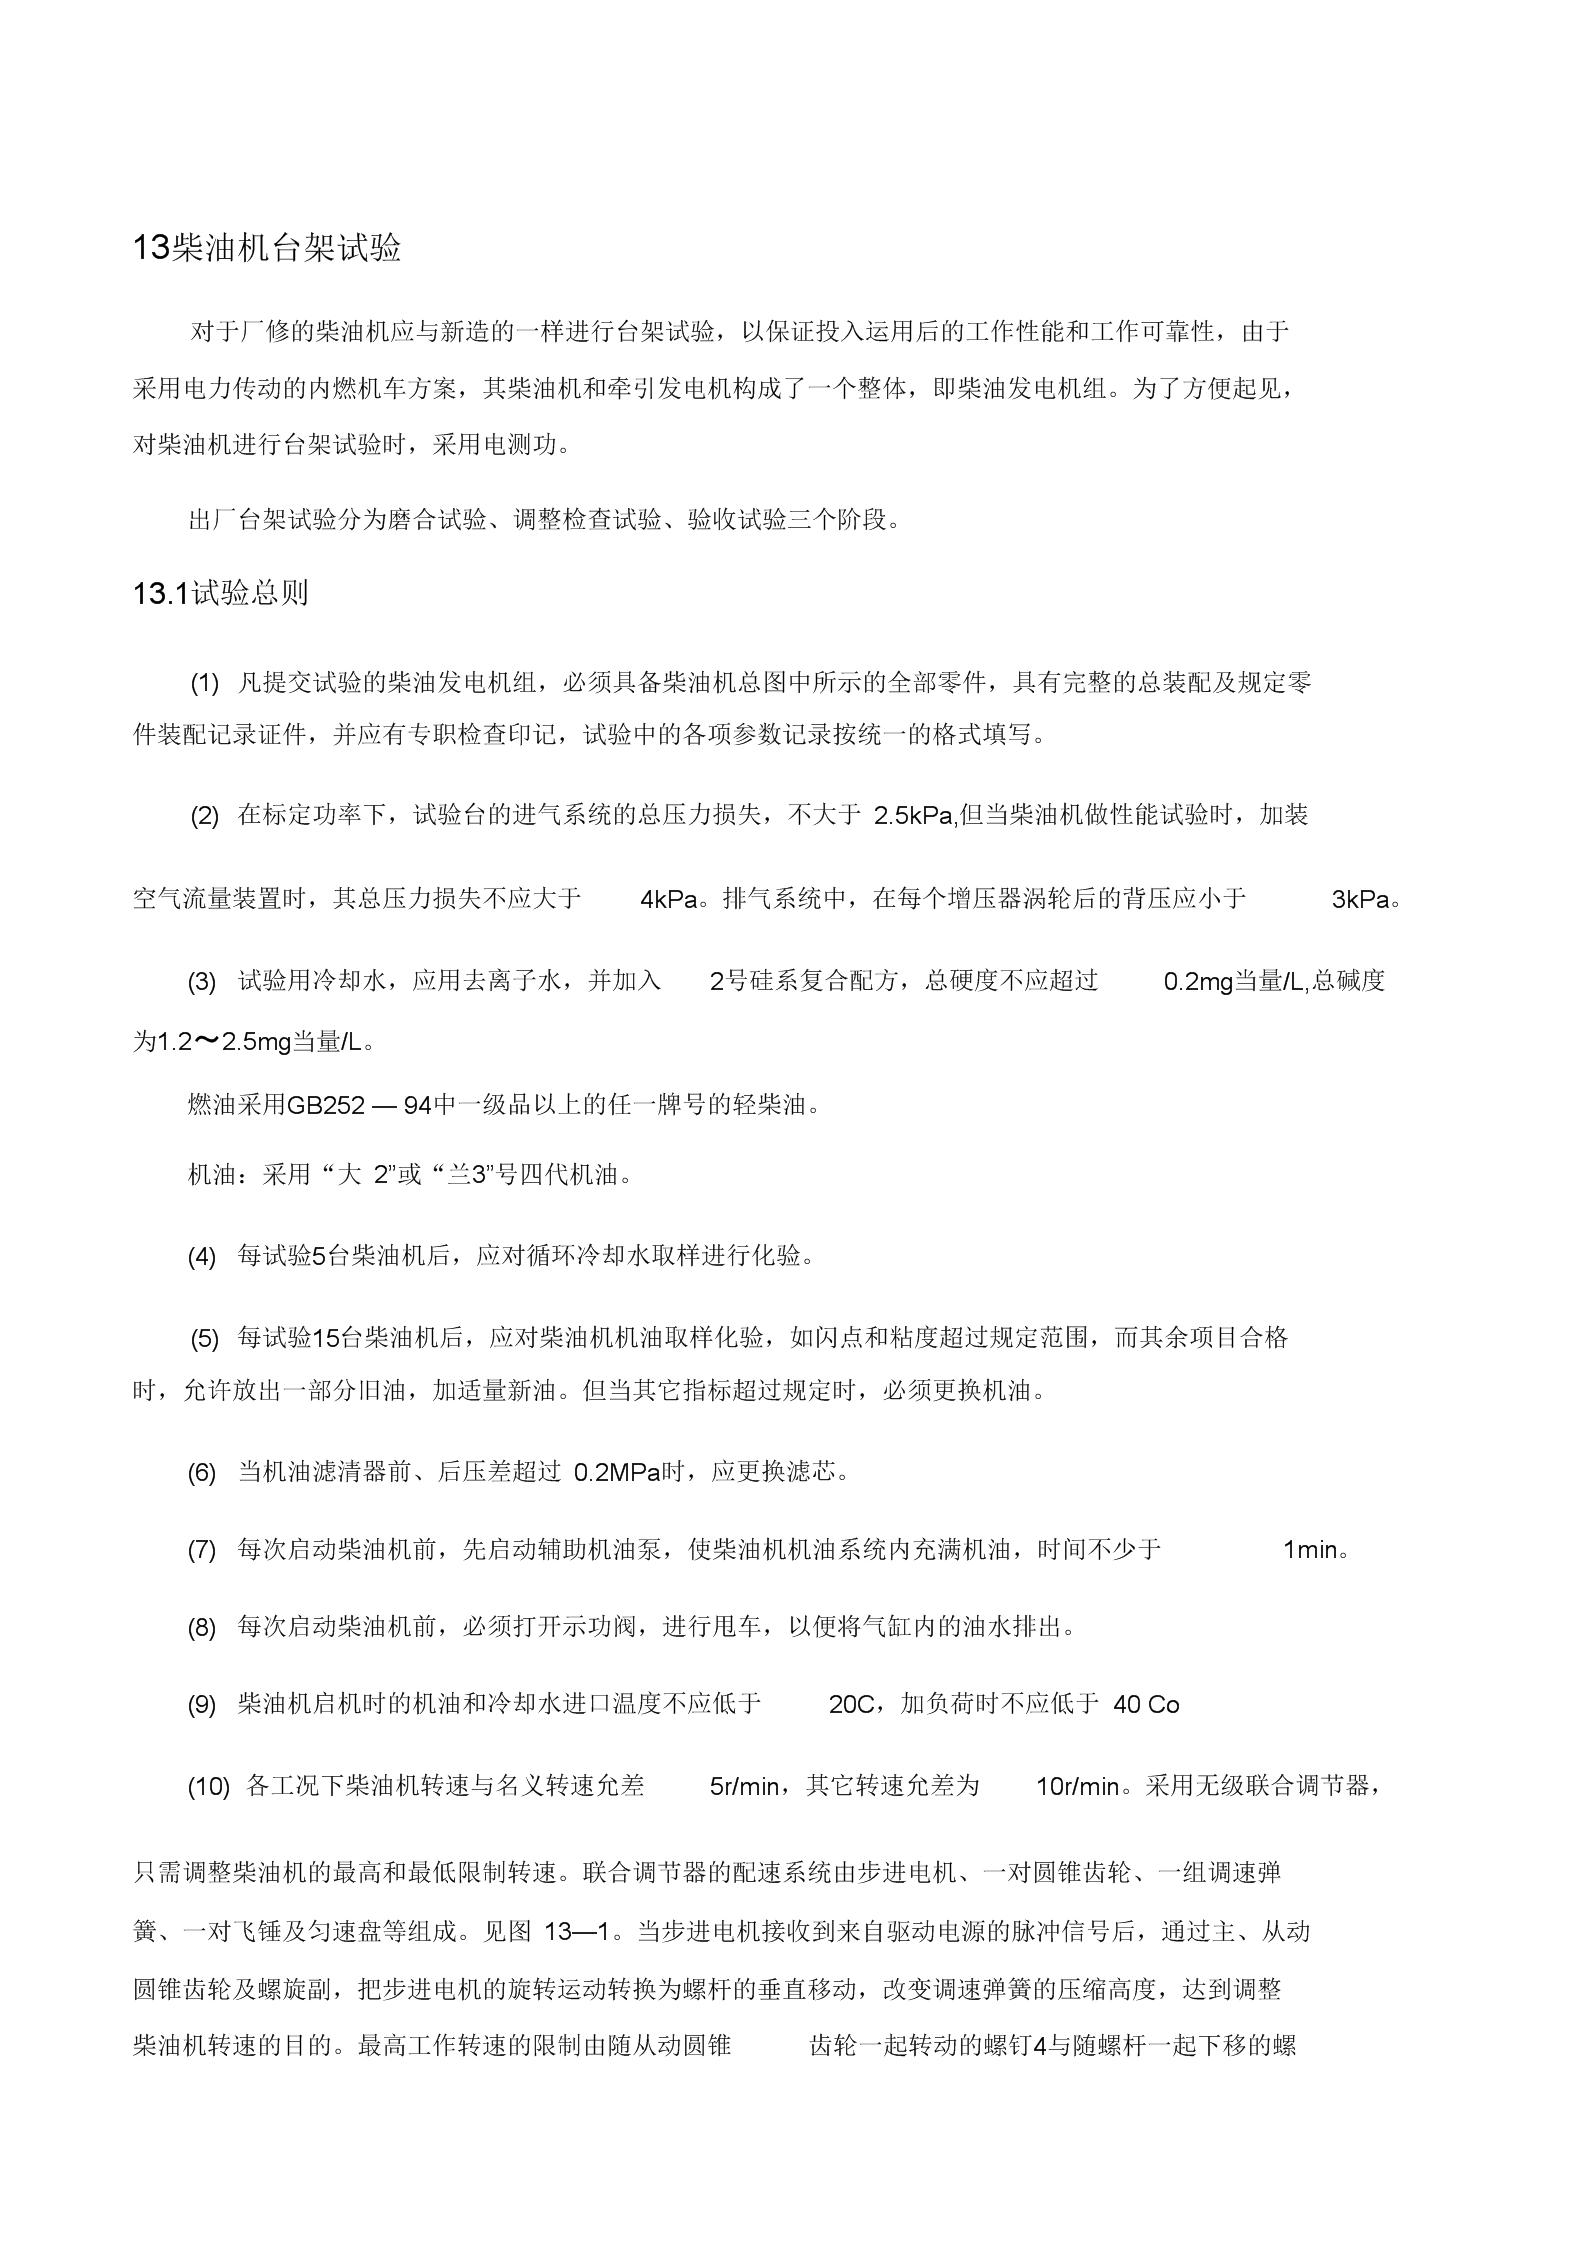 DF4D柴油机台架试验.docx